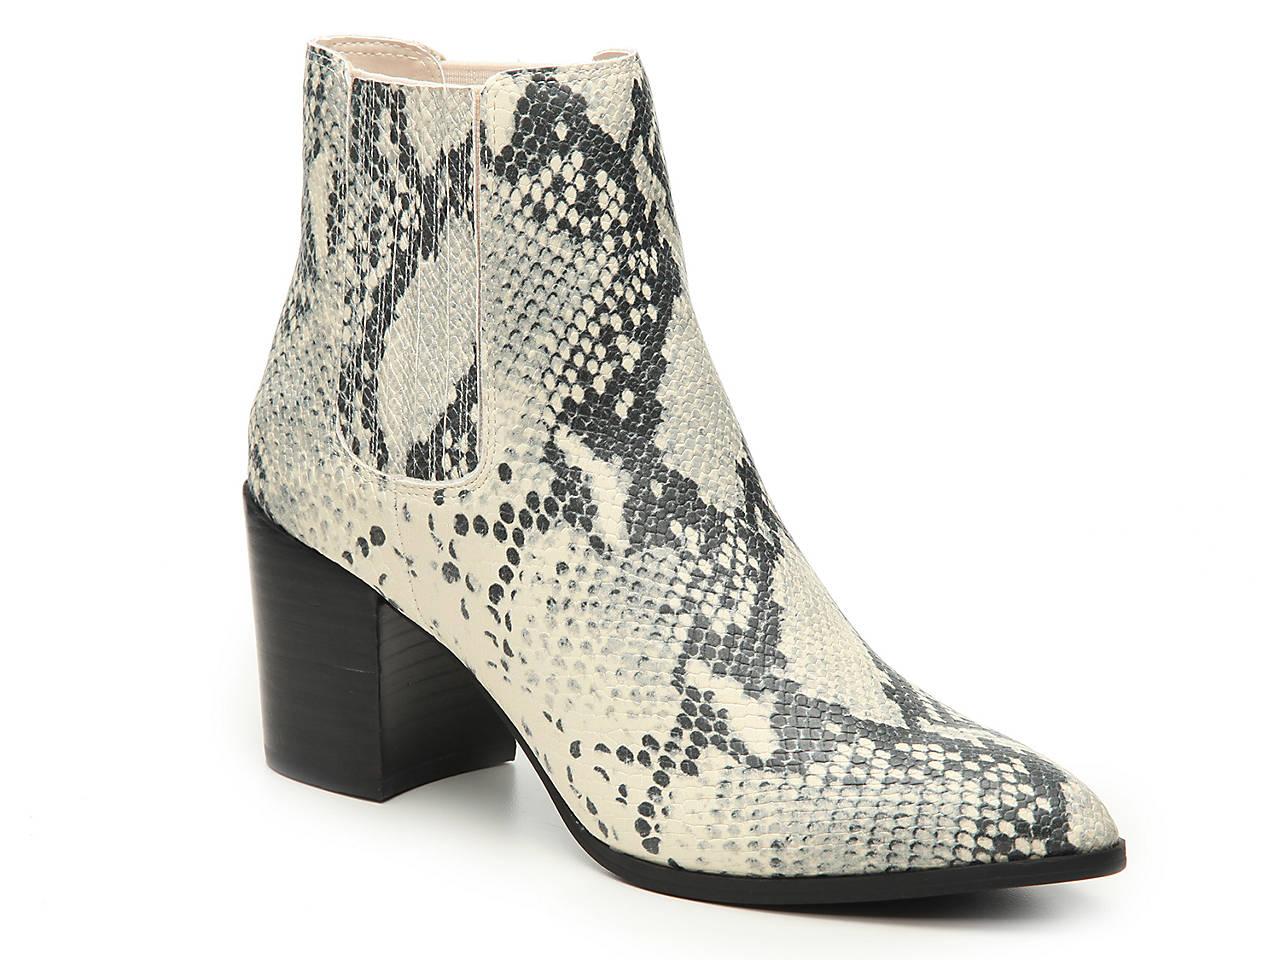 ad81df529ed Steve Madden Jain Bootie Women s Shoes